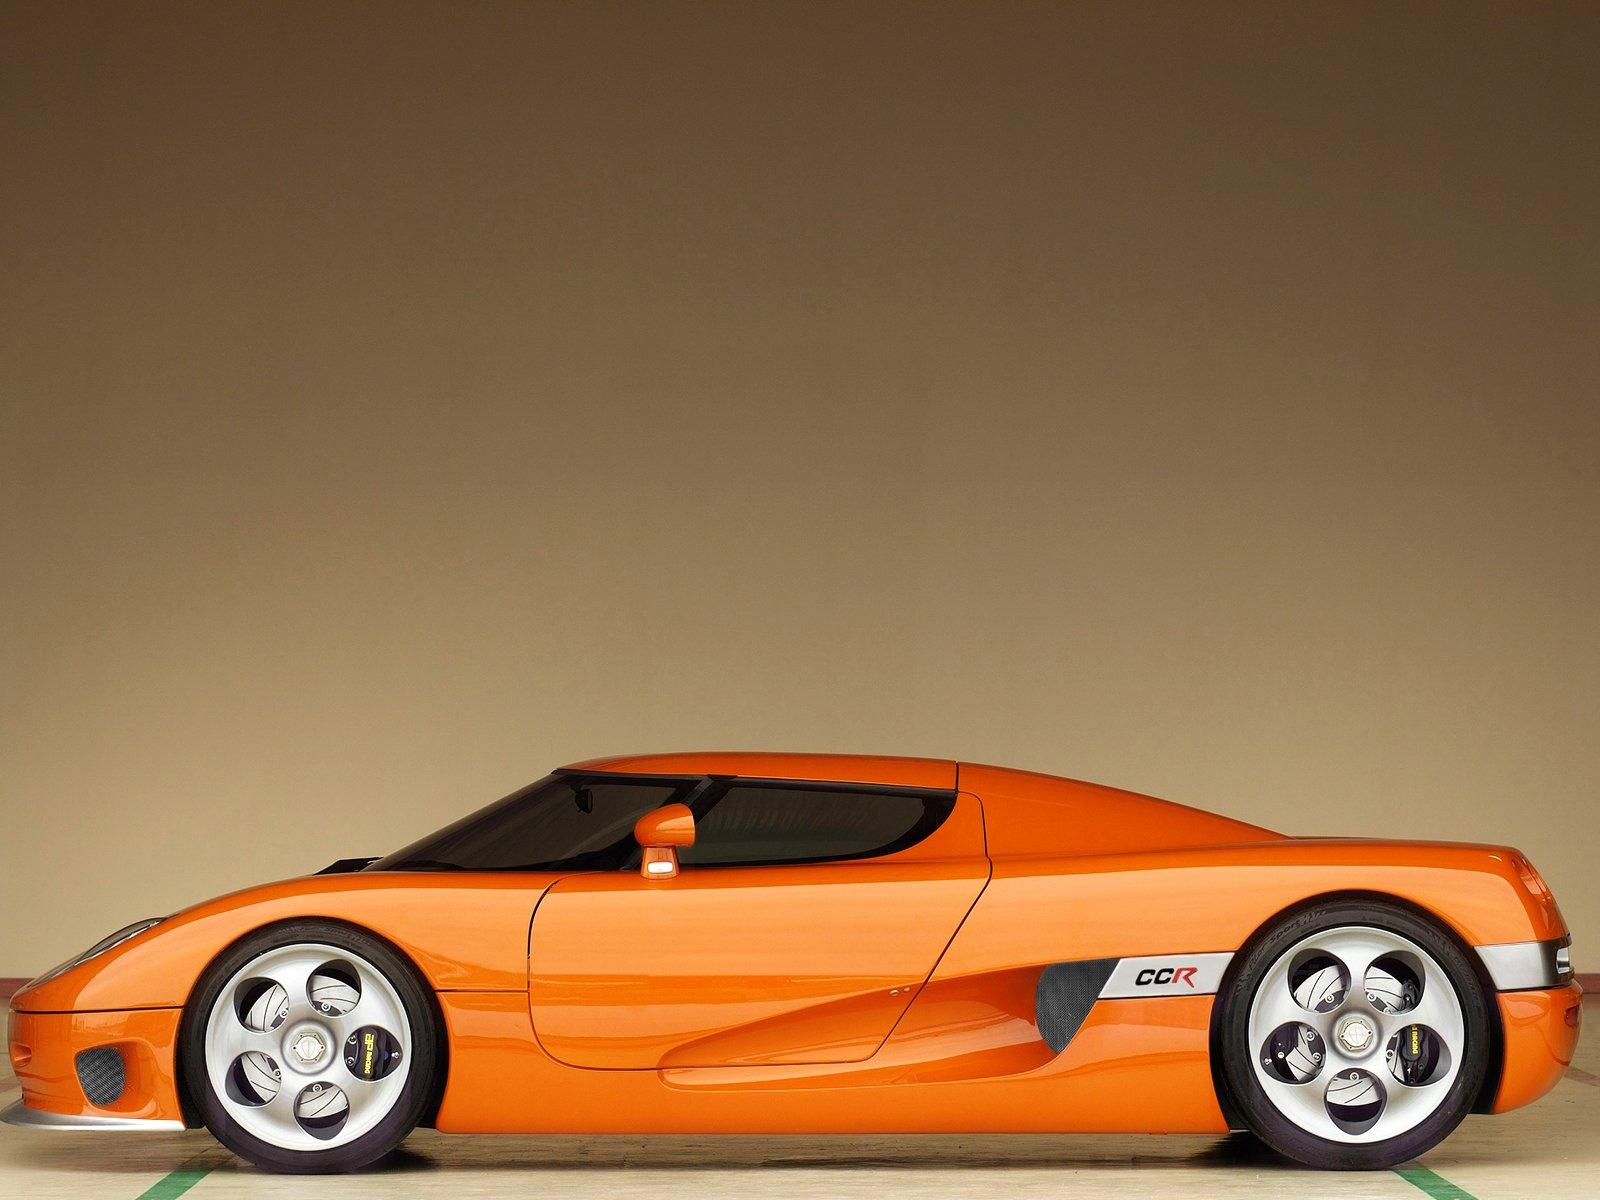 cars exotic supercars wallpaper - photo #14